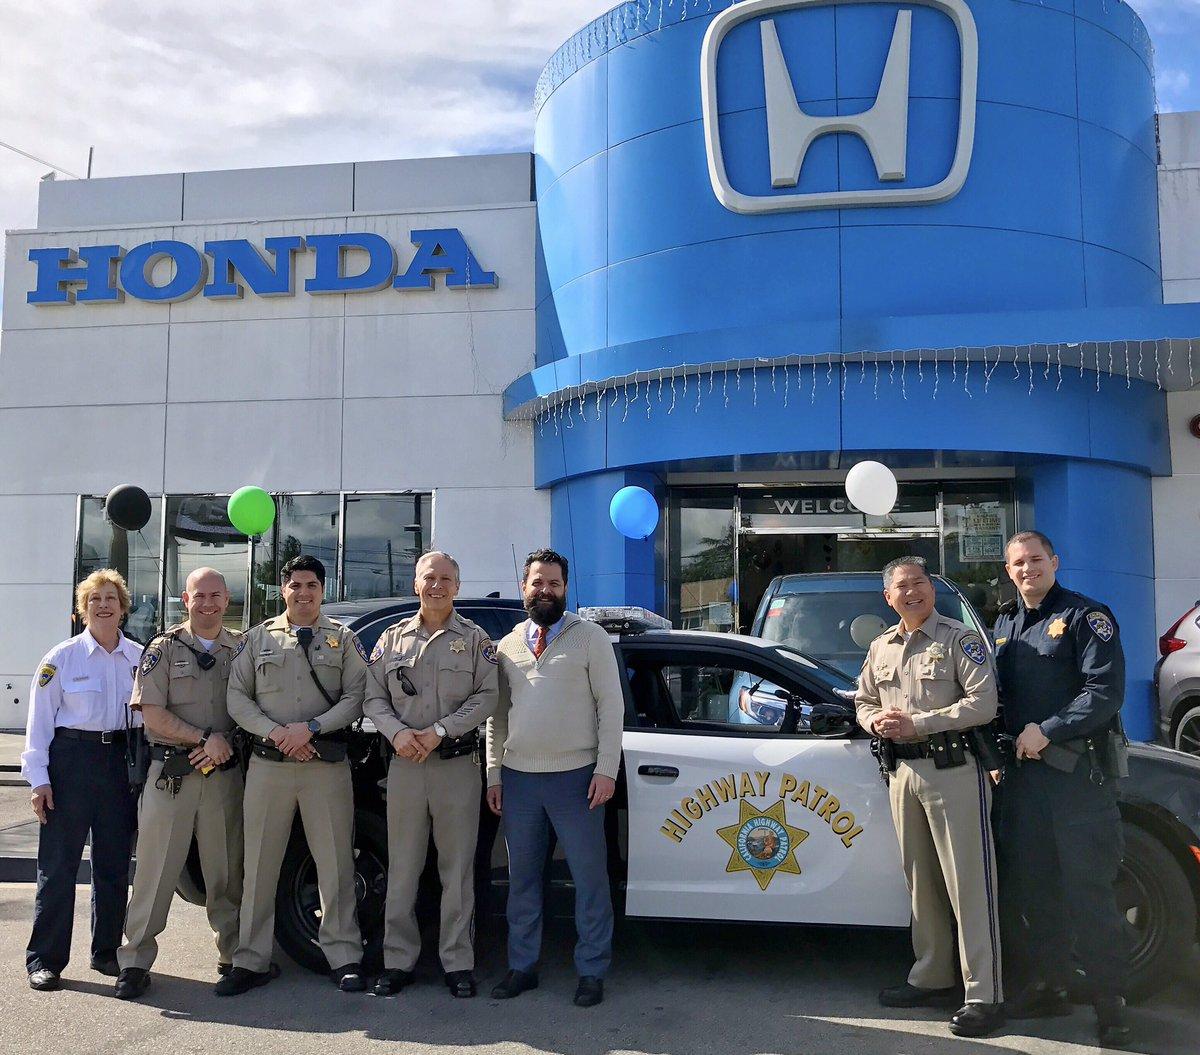 California Highway Patrol, West Valley Area on Twitter: